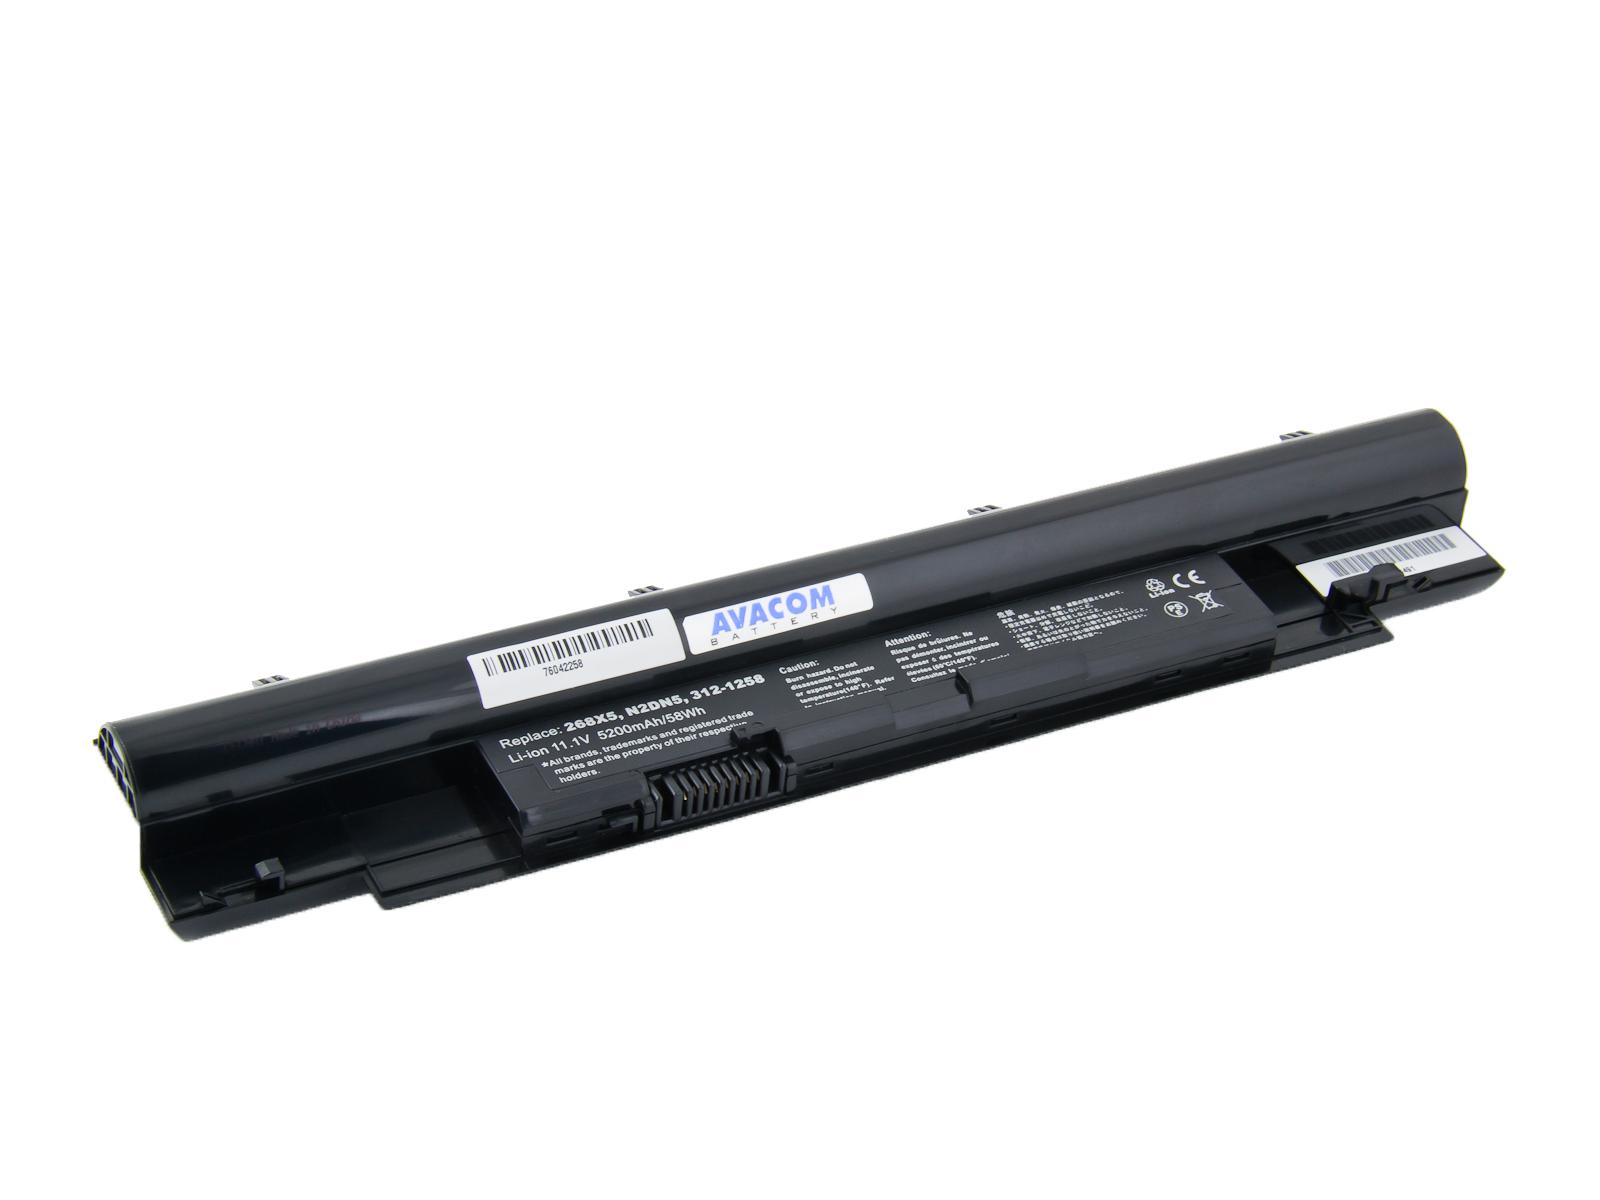 Baterie AVACOM NODE-IN41-806 pro Dell Inspiron N411z, Vostro V131 Li-Ion 11,1V 5200mAh/58Wh